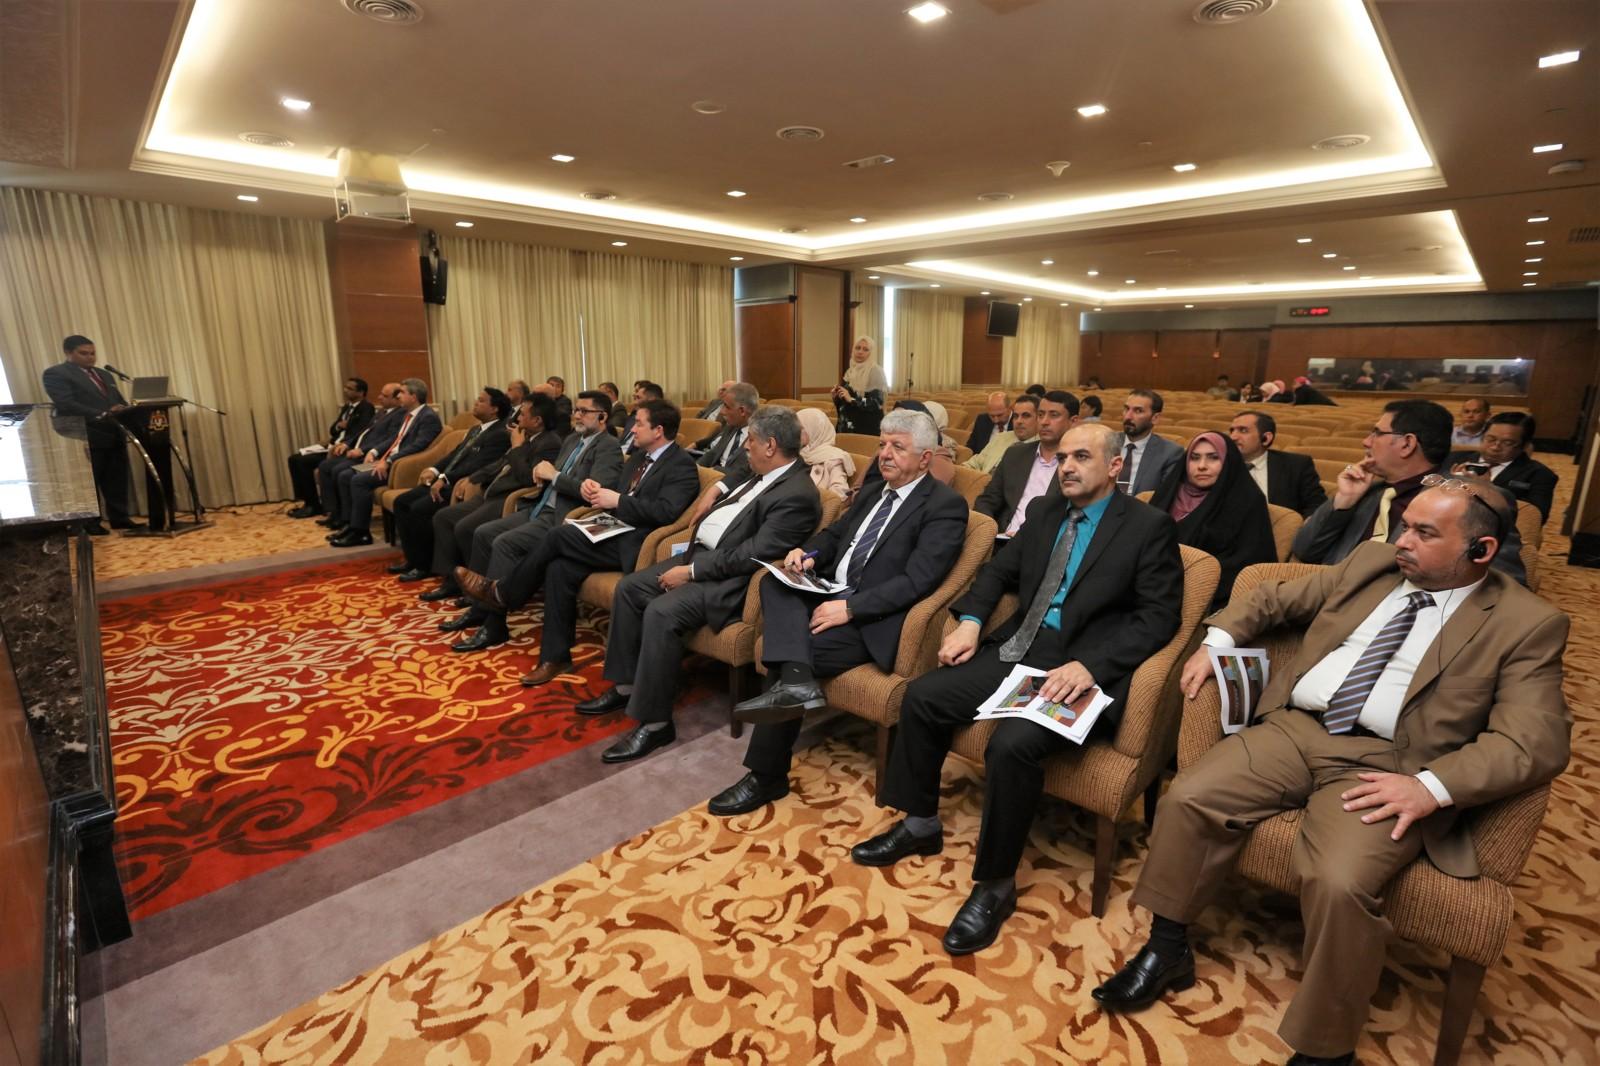 lawatan-pegawai-pegawai-kanan-iraq-dan-urus-setia-institute-on-governance--ottawa-canada-ke-parlimen-malaysia